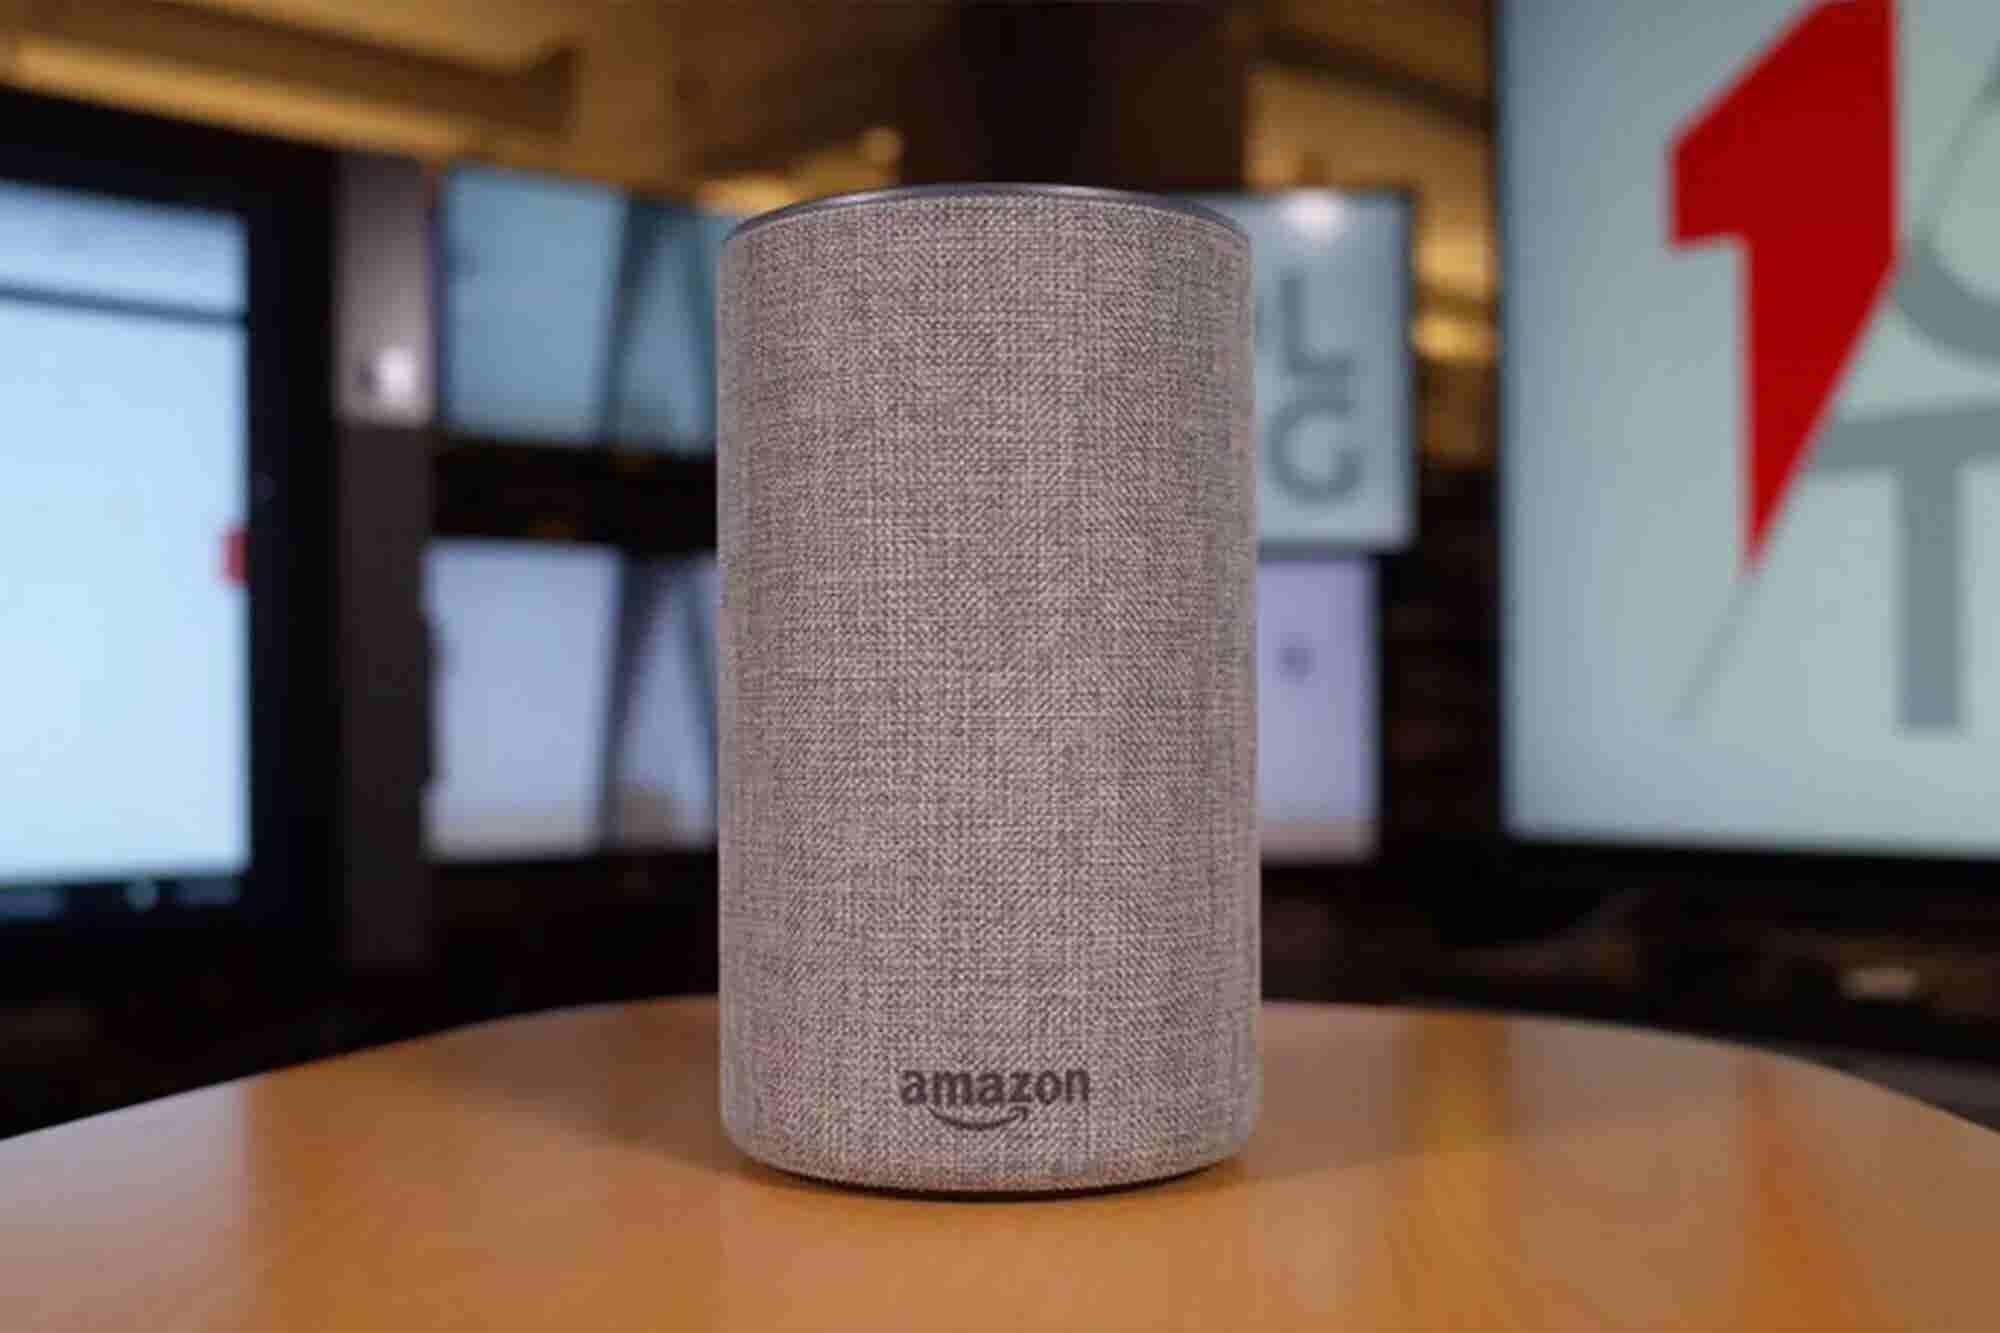 Amazon Pays Thousands of People to Listen to Alexa Voice Recordings